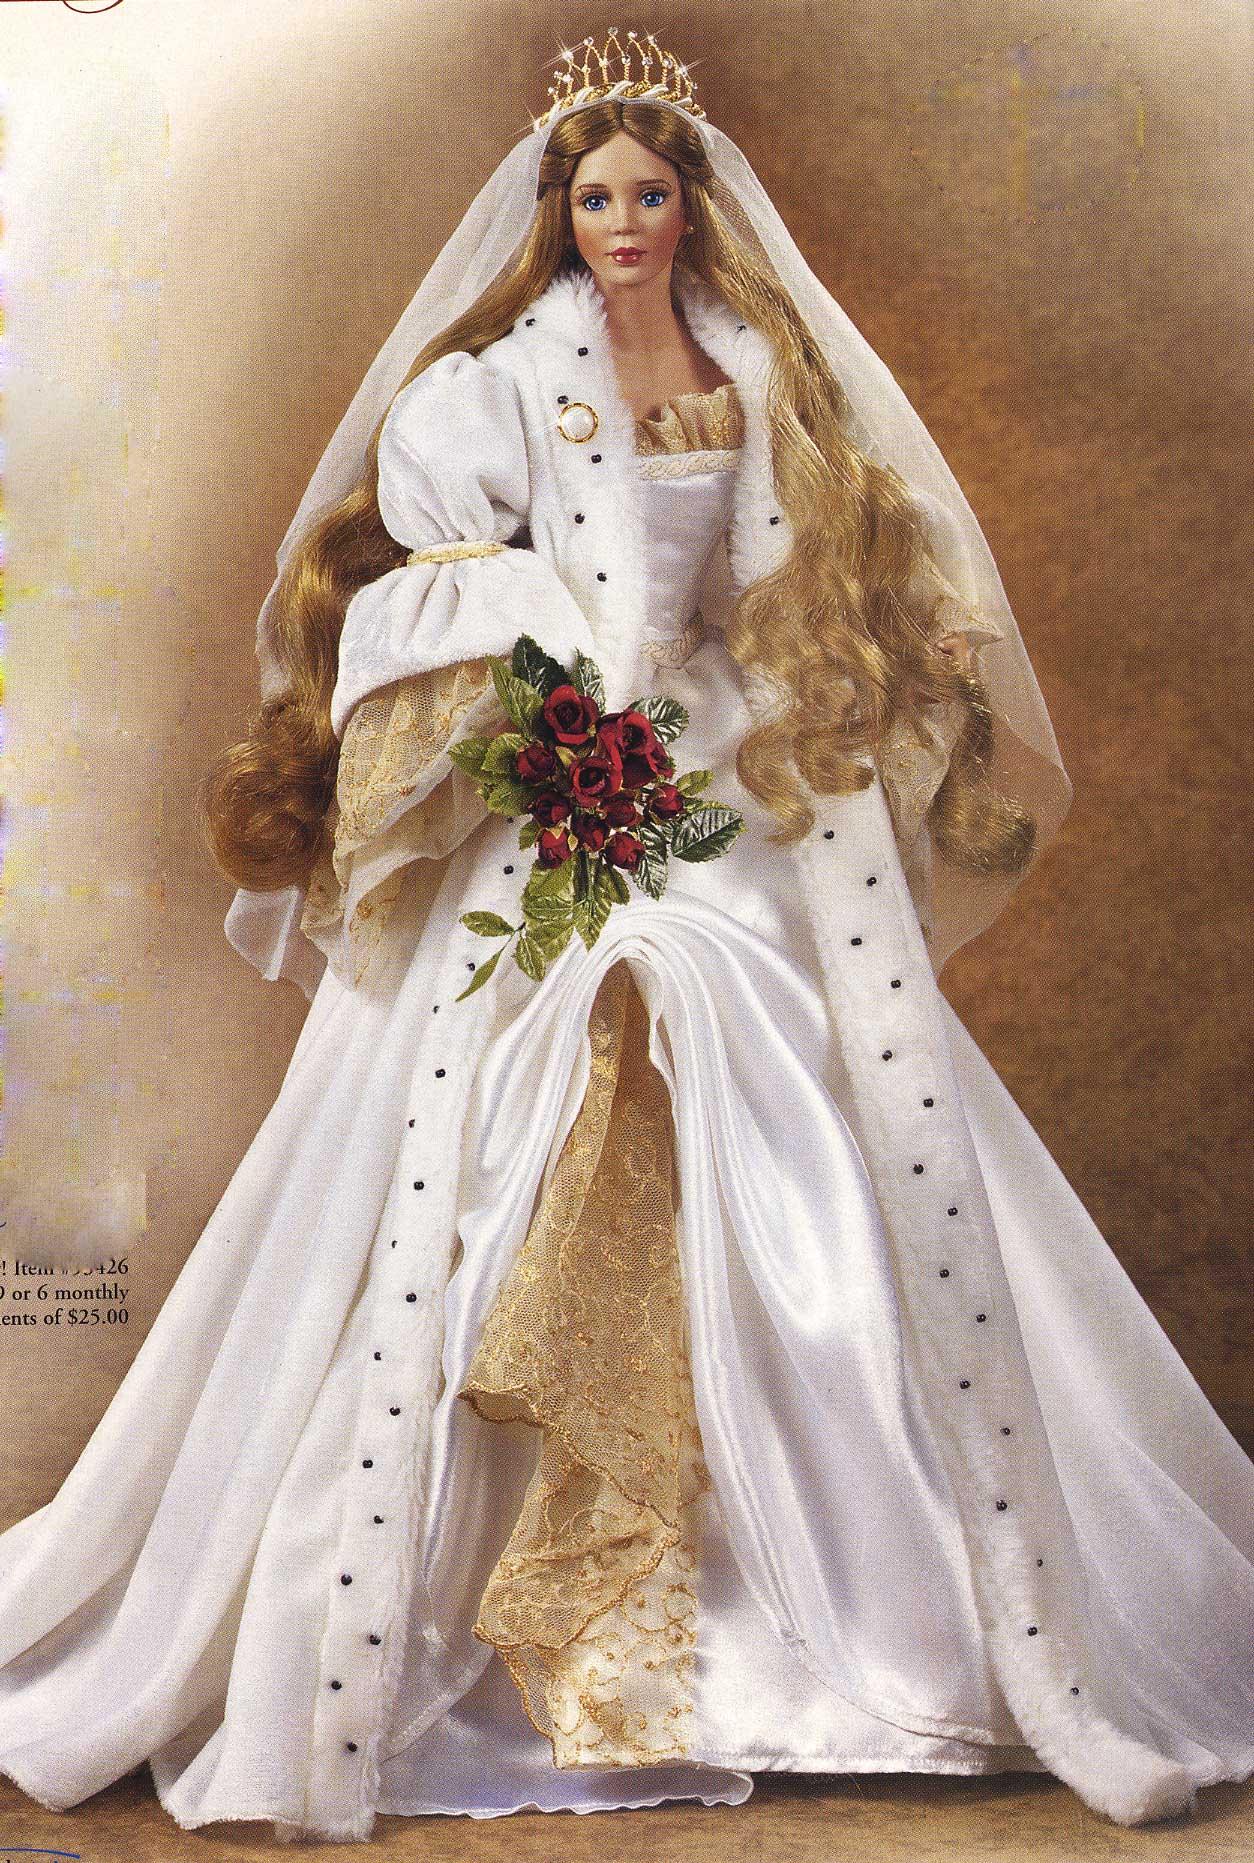 Bride Fairy Tale 2 Sleeping Beauty Doll By Cindy Mcclure